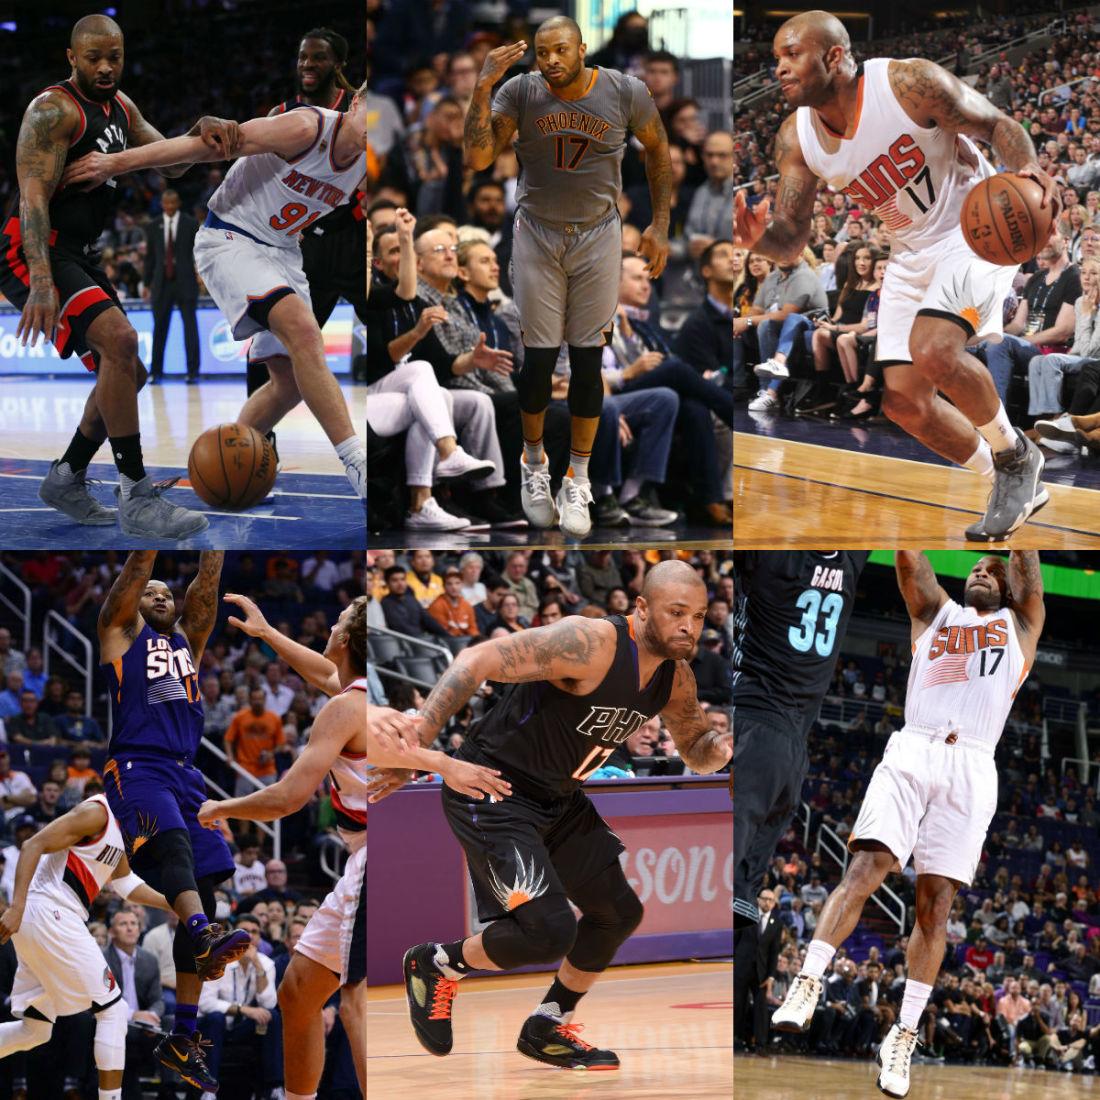 e41d38dc289f6b ... Nike Zoom Huarache 2K4 PE (2)  p.j. tucker. Images via Getty ImagesNBAE  ...